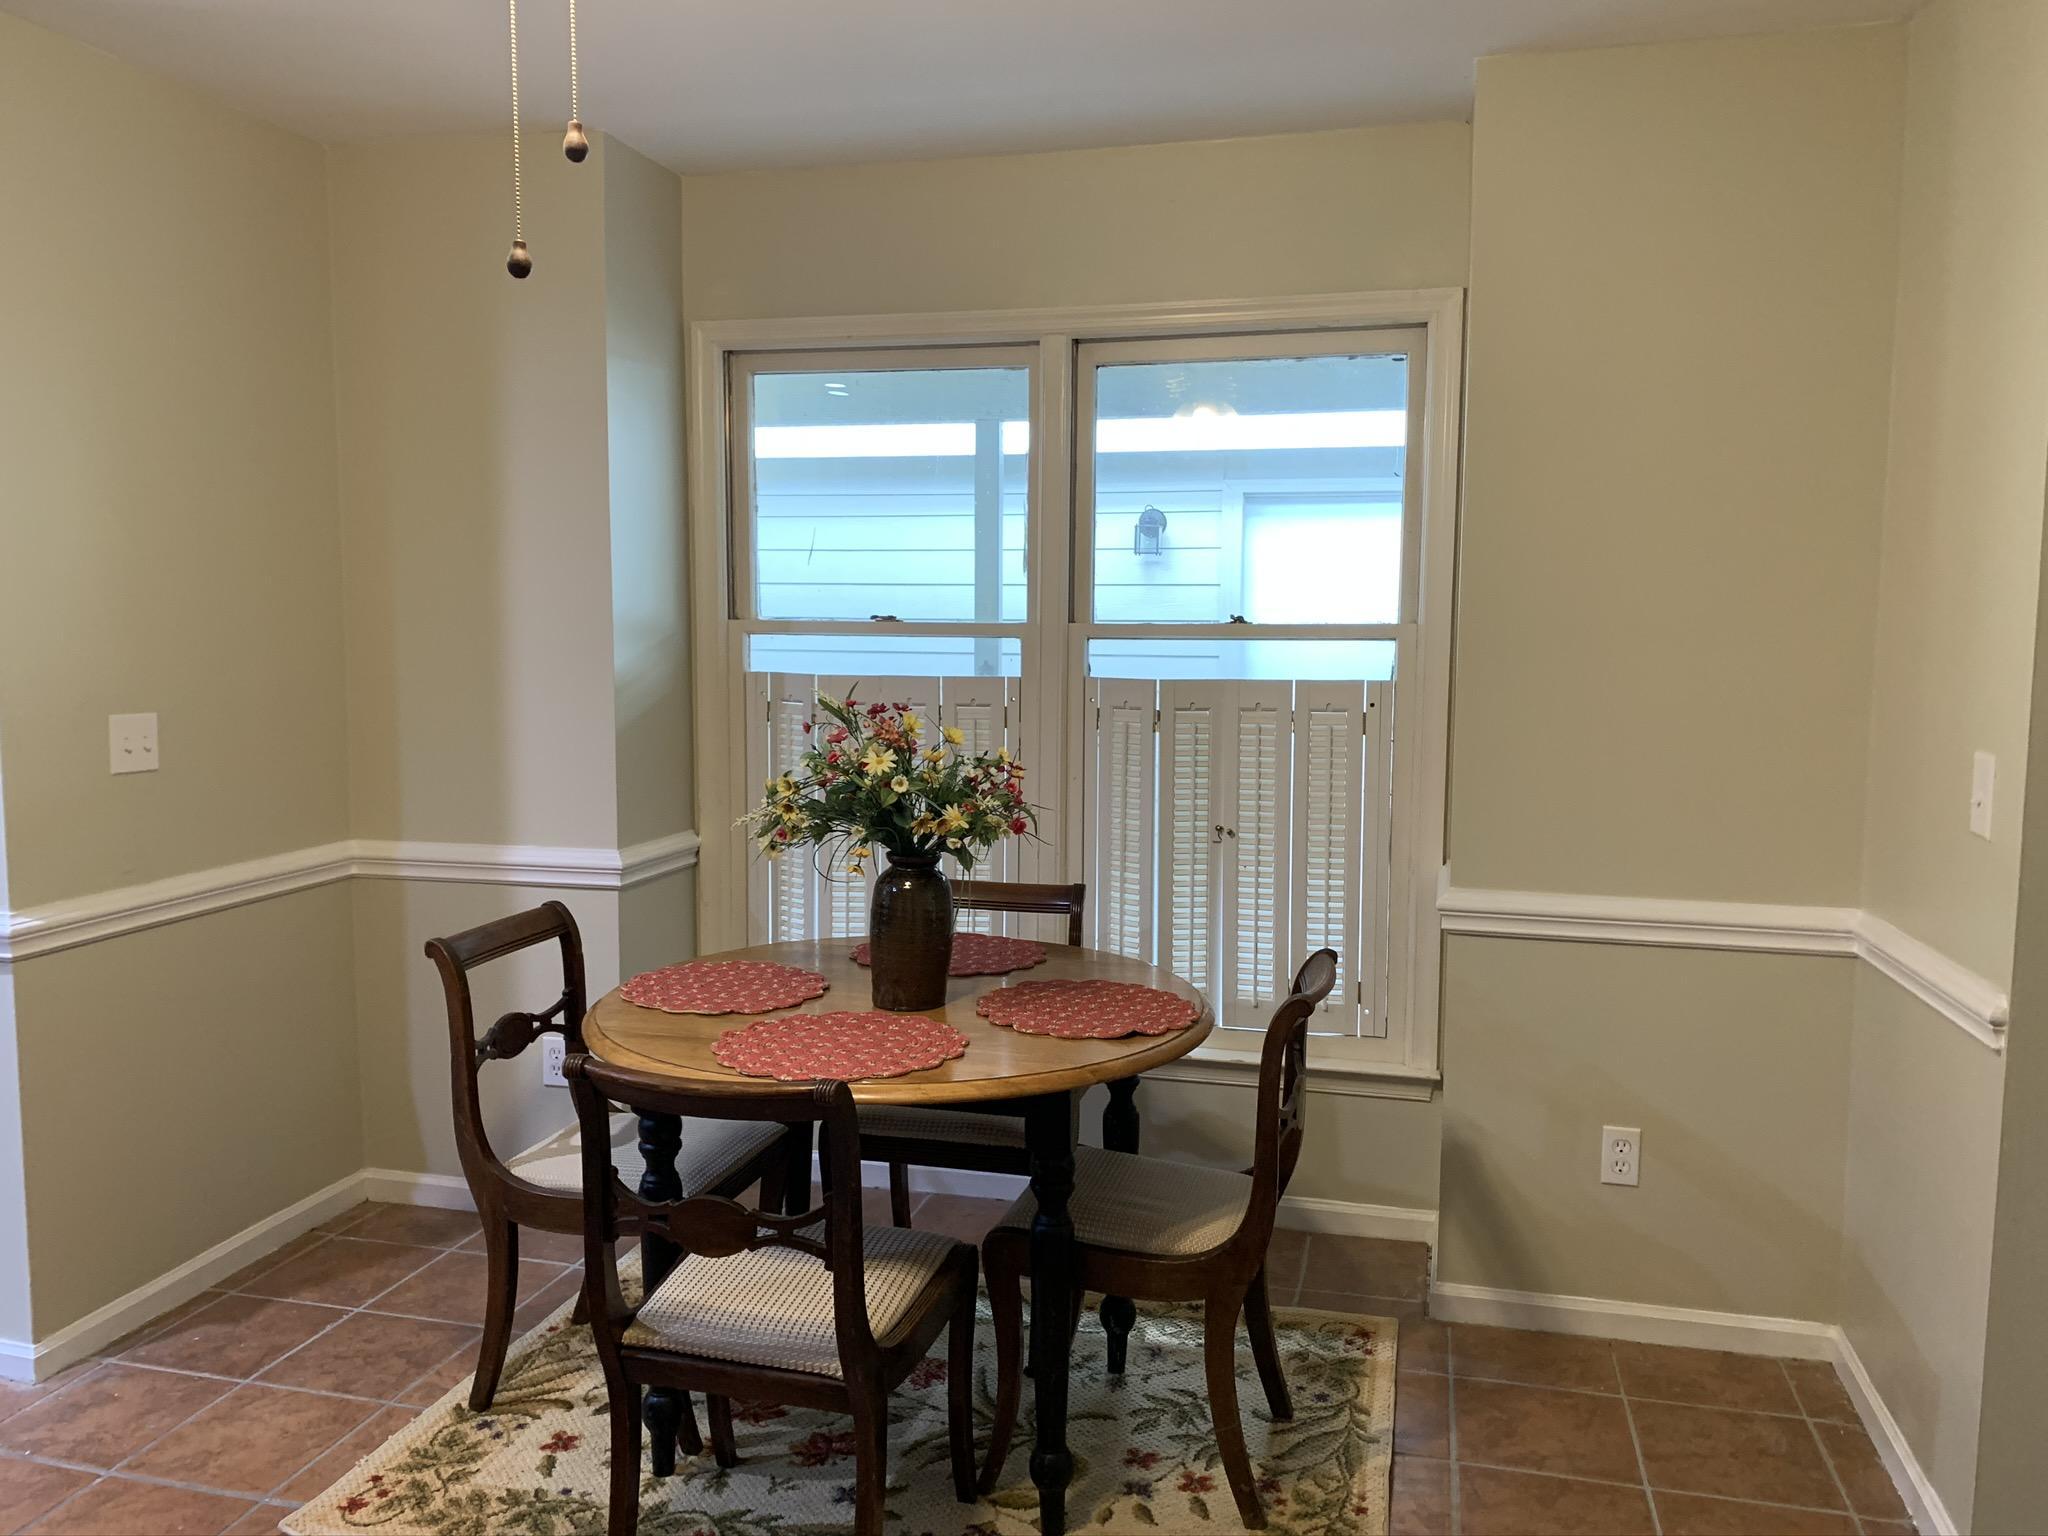 Fox Pond Homes For Sale - 662 Poaug, Mount Pleasant, SC - 6